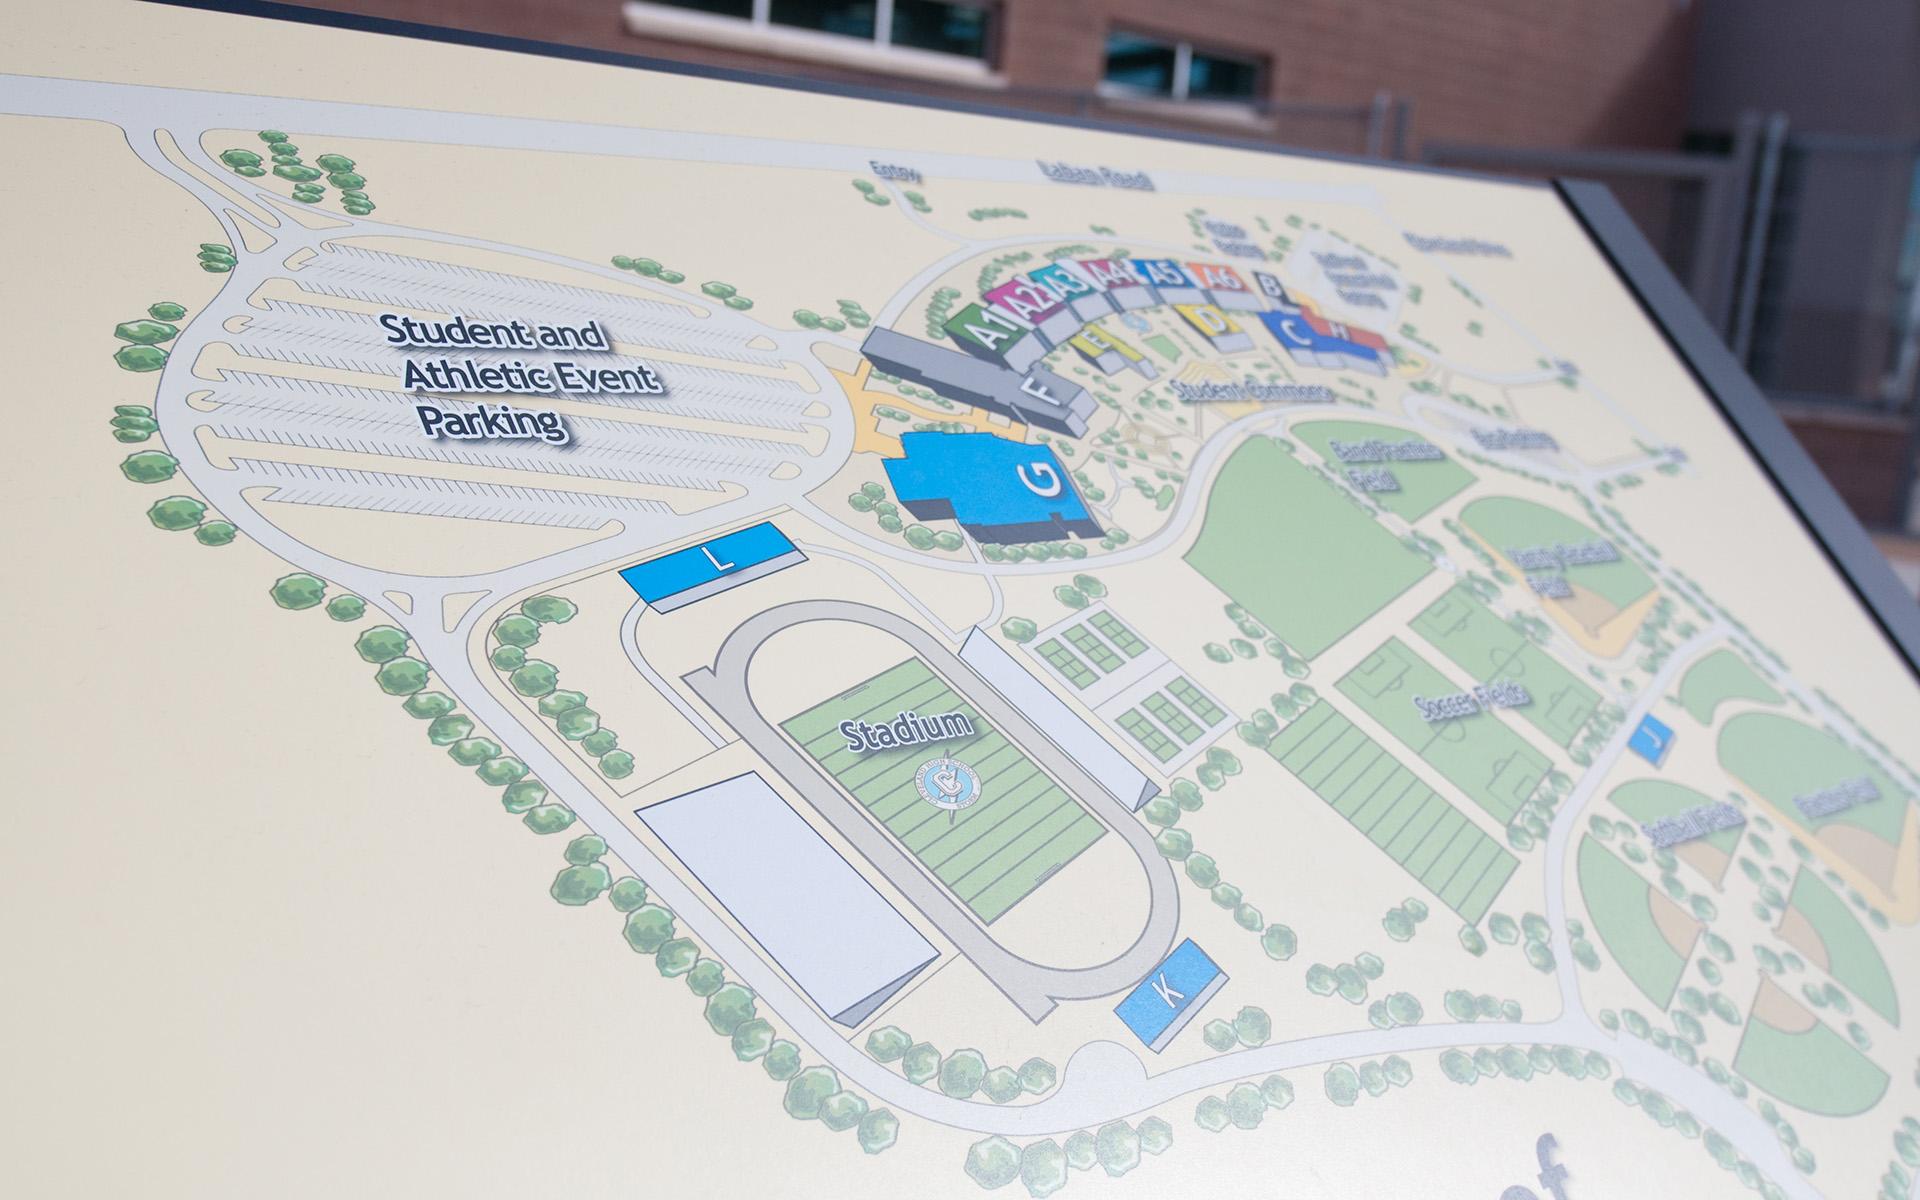 V Sue Cleveland High School Map